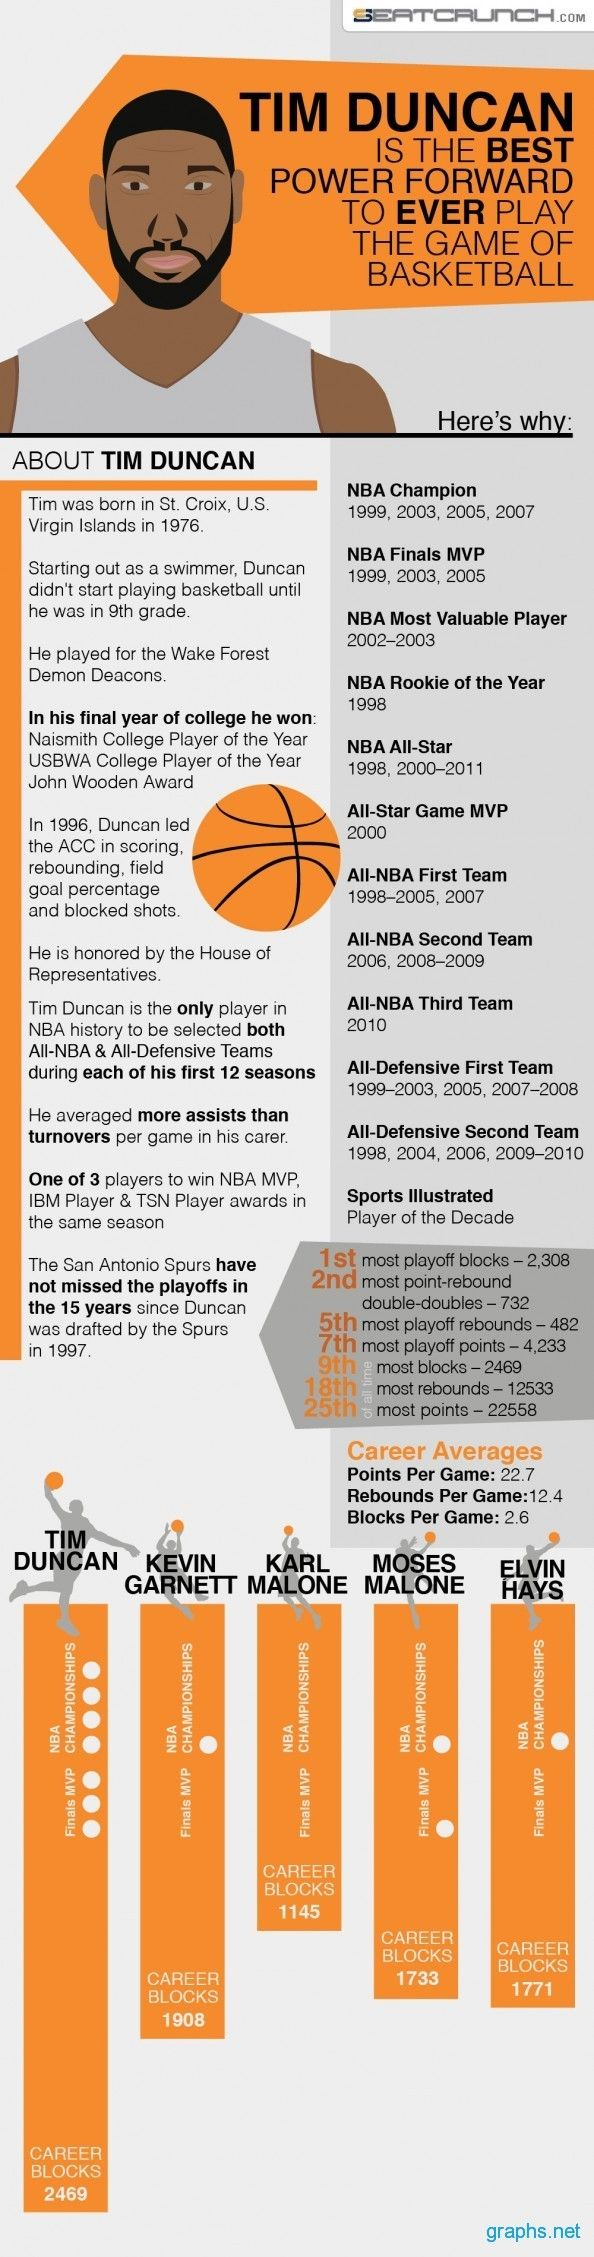 Tim Duncan Stats #sports #tim #duncan